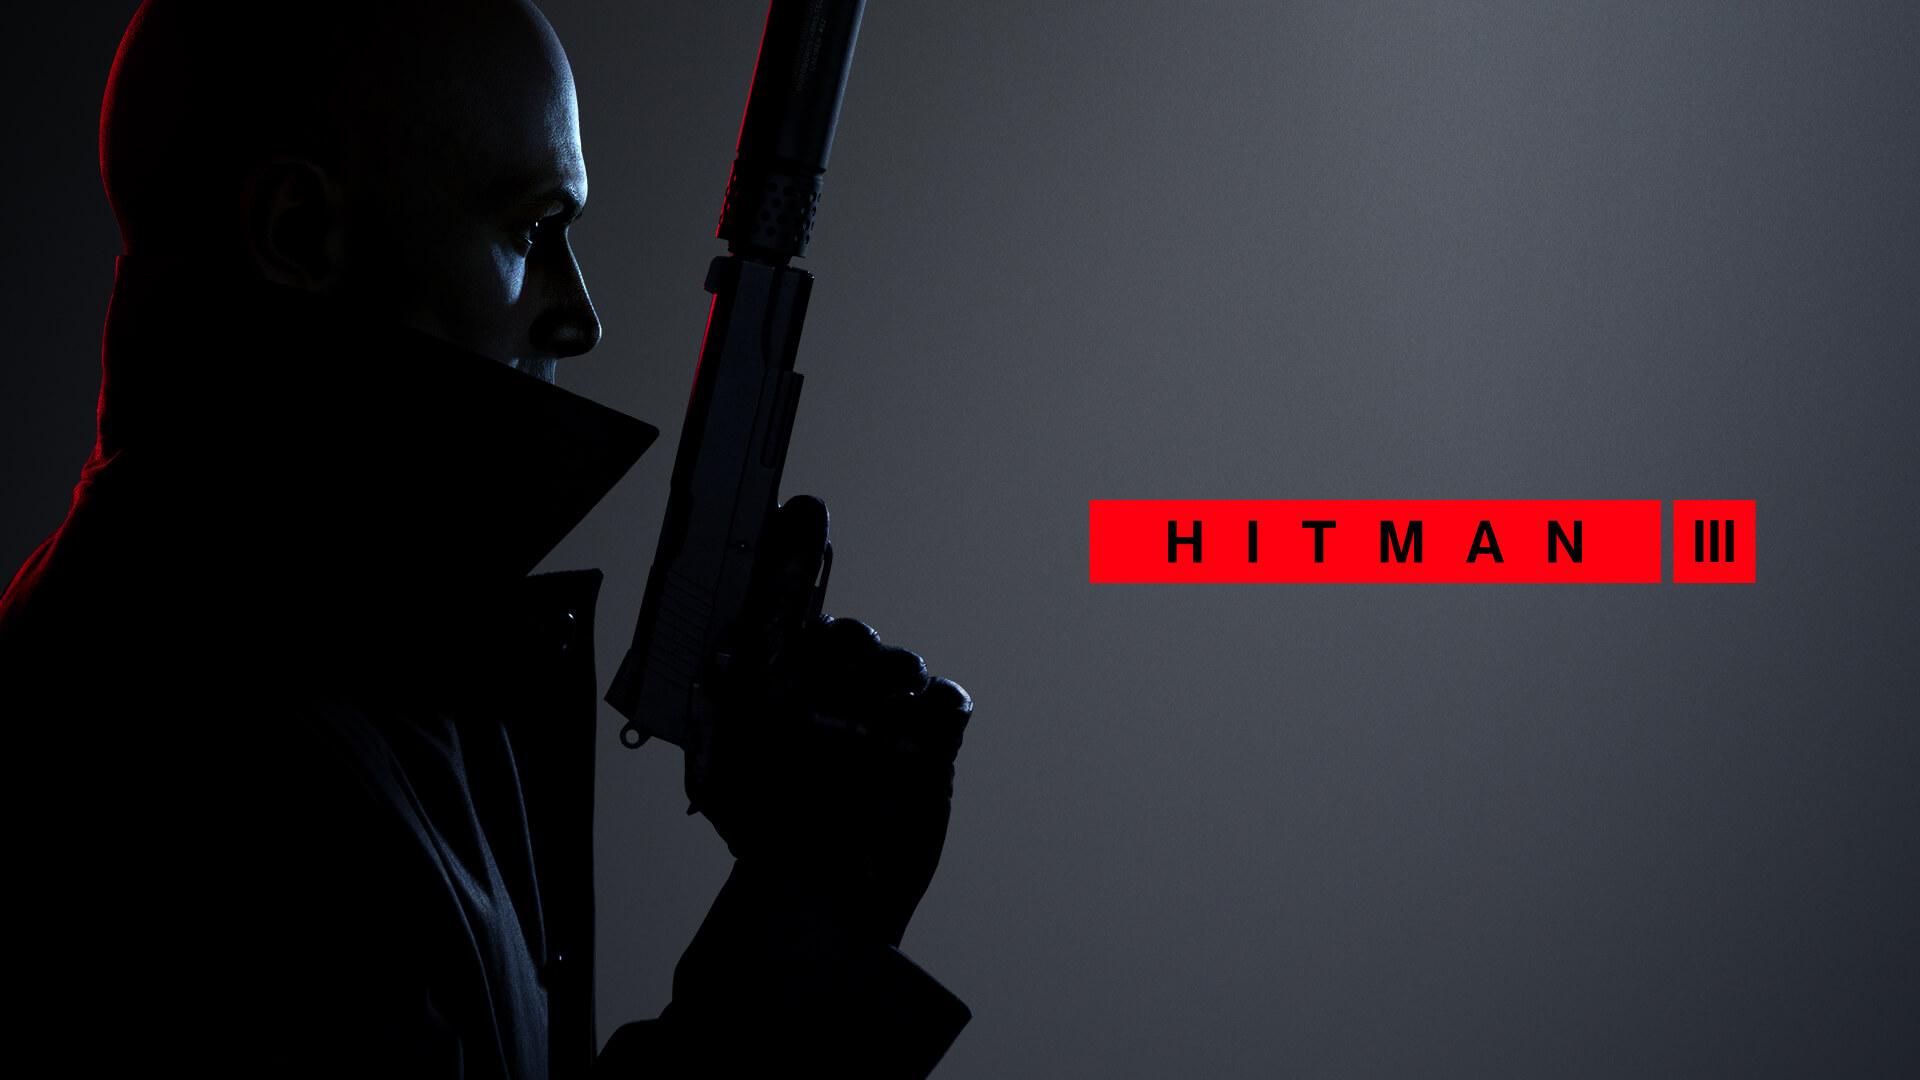 Hitman 3 On Sale Now